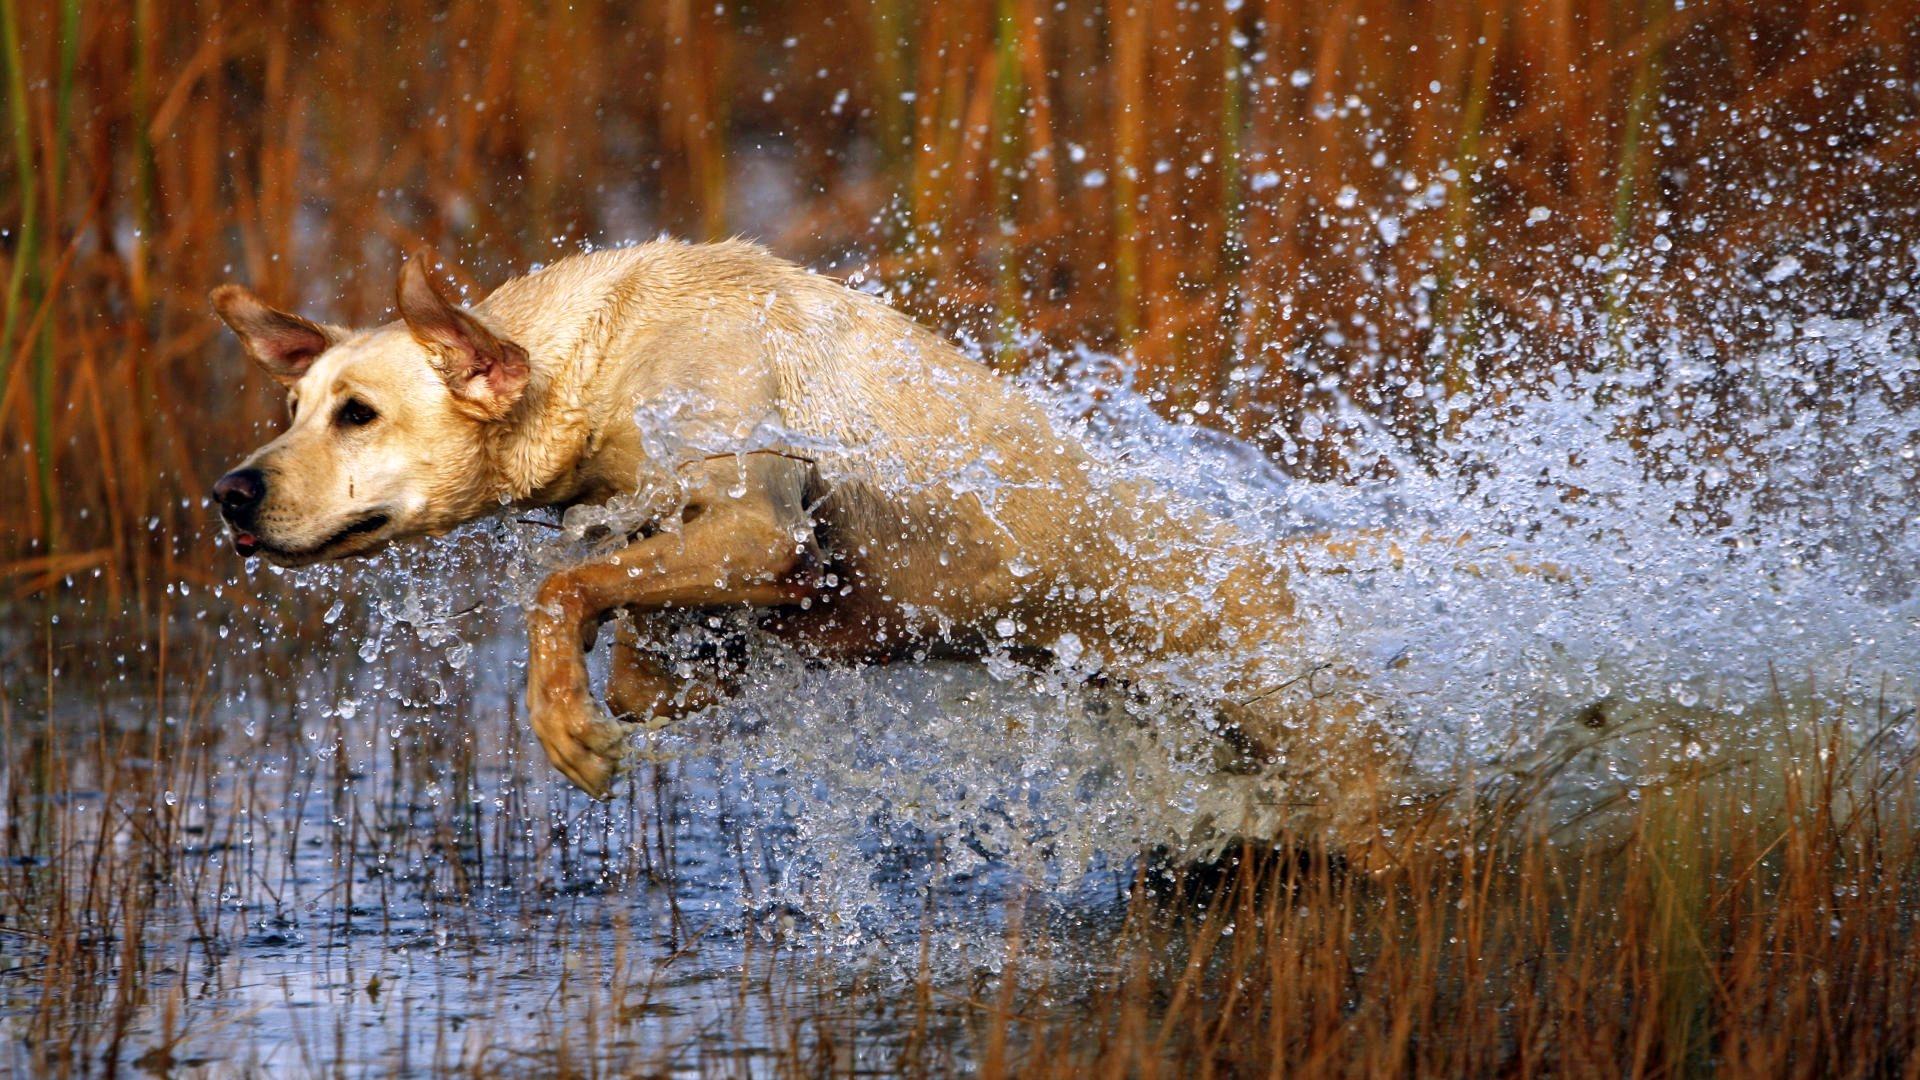 Wallpaper dog Labrador jump water grass hunting